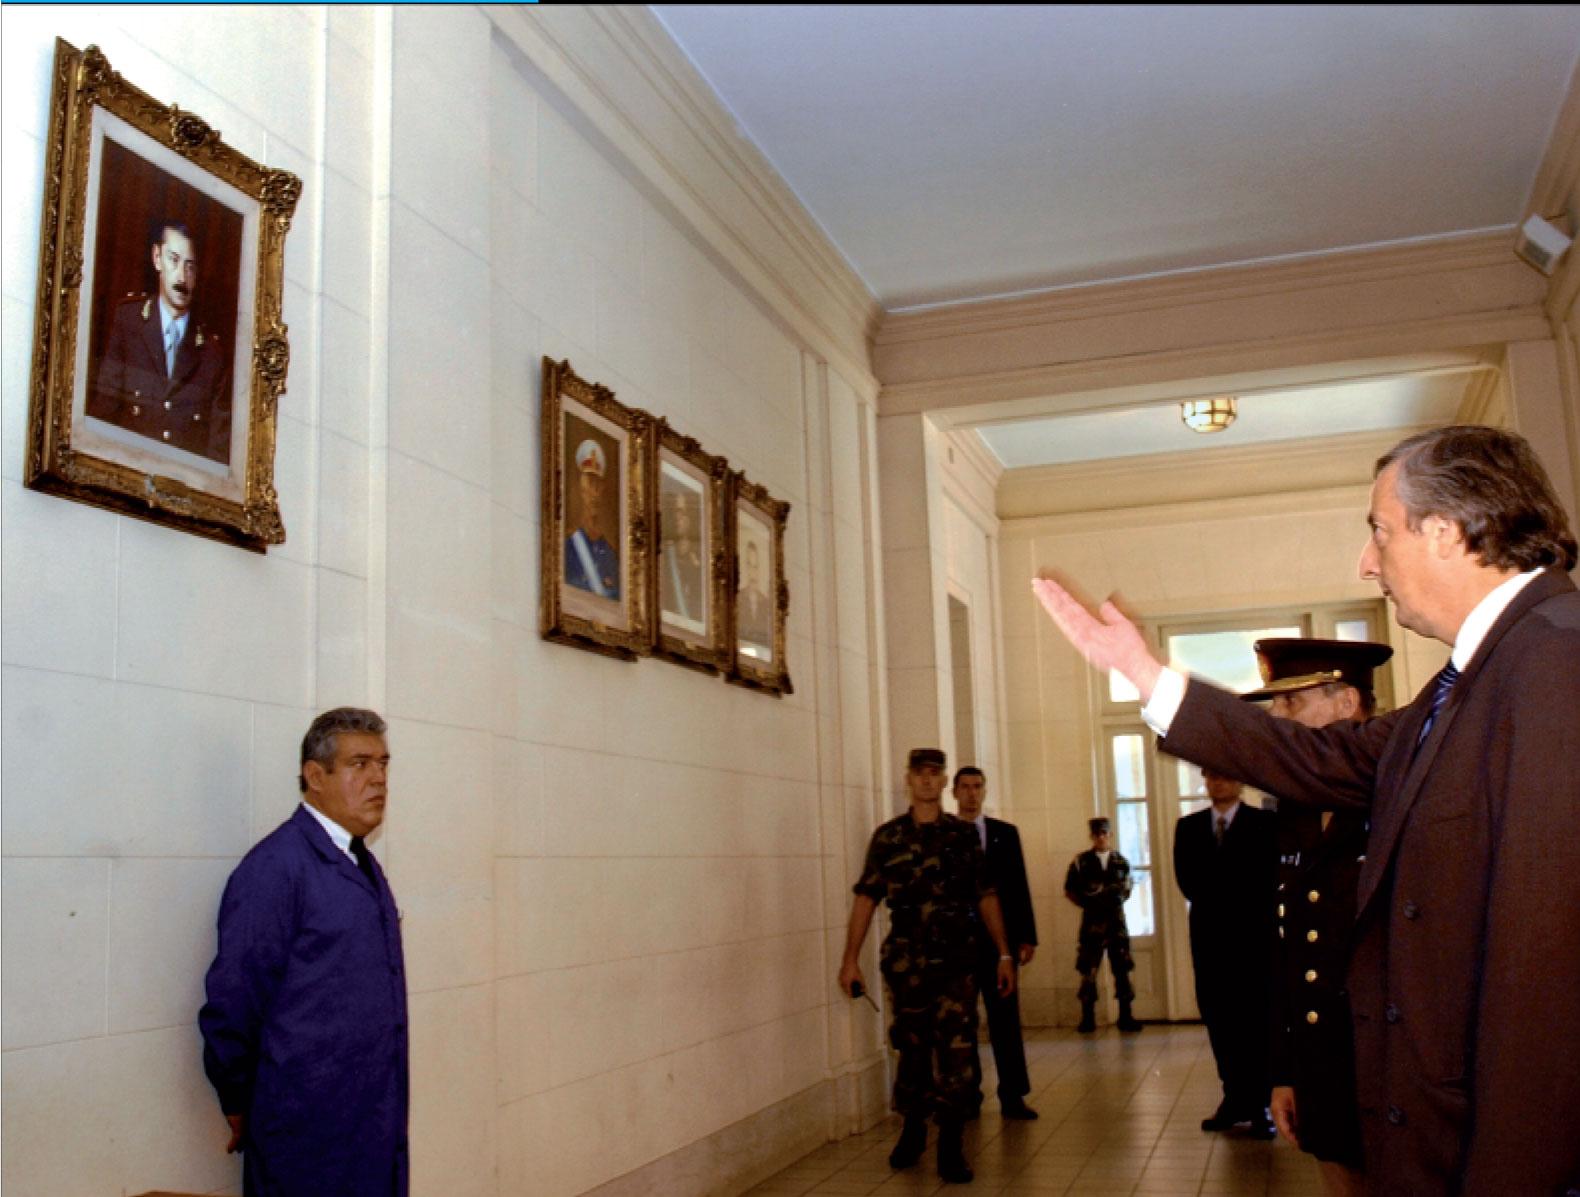 Nestor Kirchner Ordena Bajar El Cuadro Del Dictador Videla